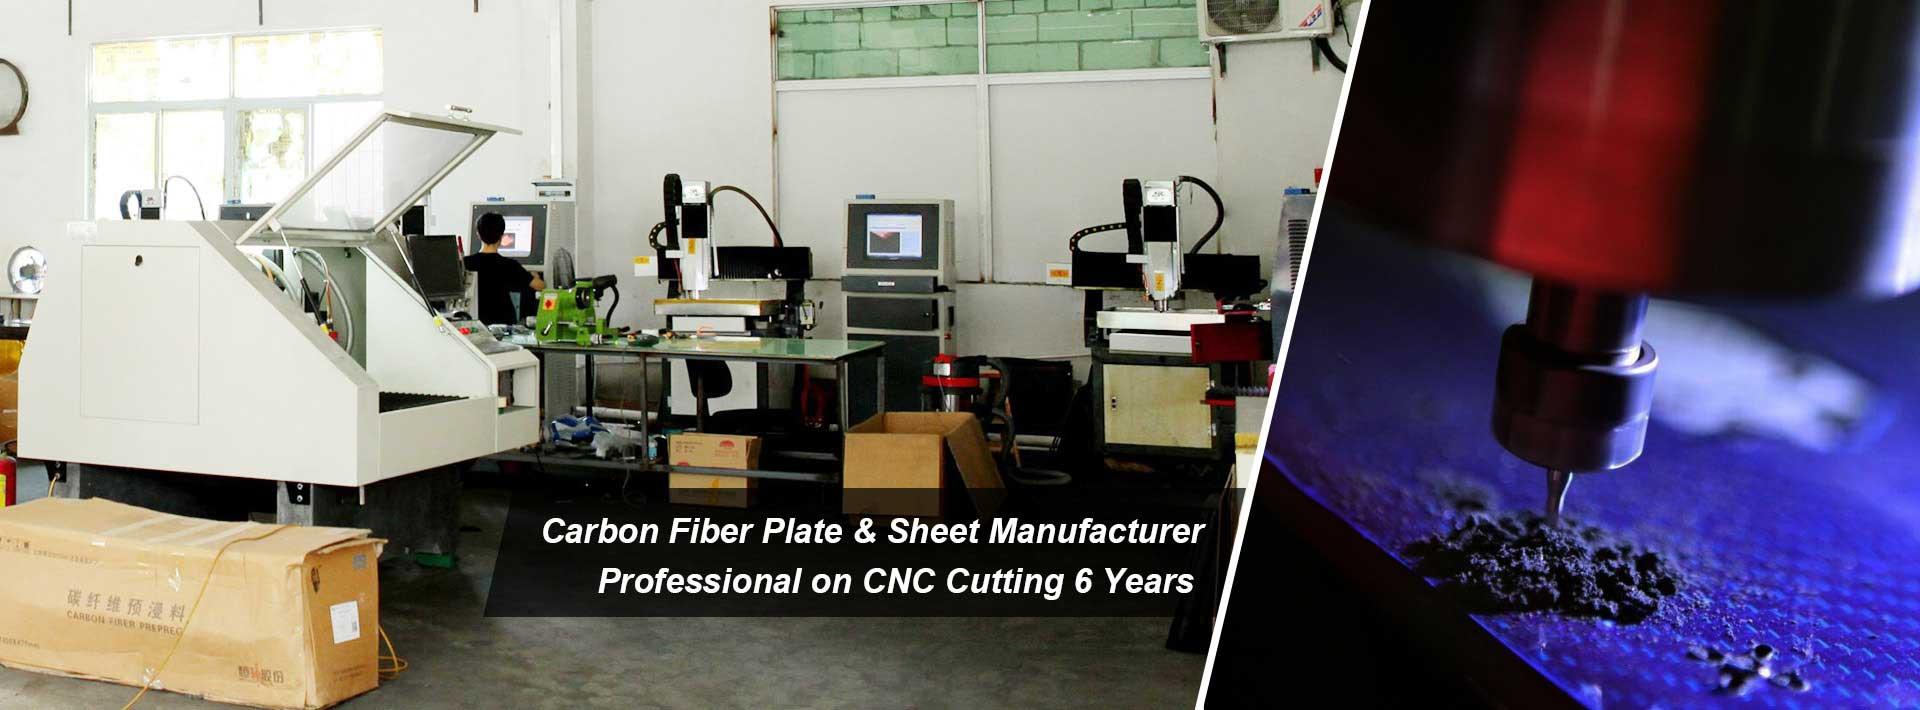 Carbon Fiber Sheets Carbon Fiber Tubes, FPV Racing Drone